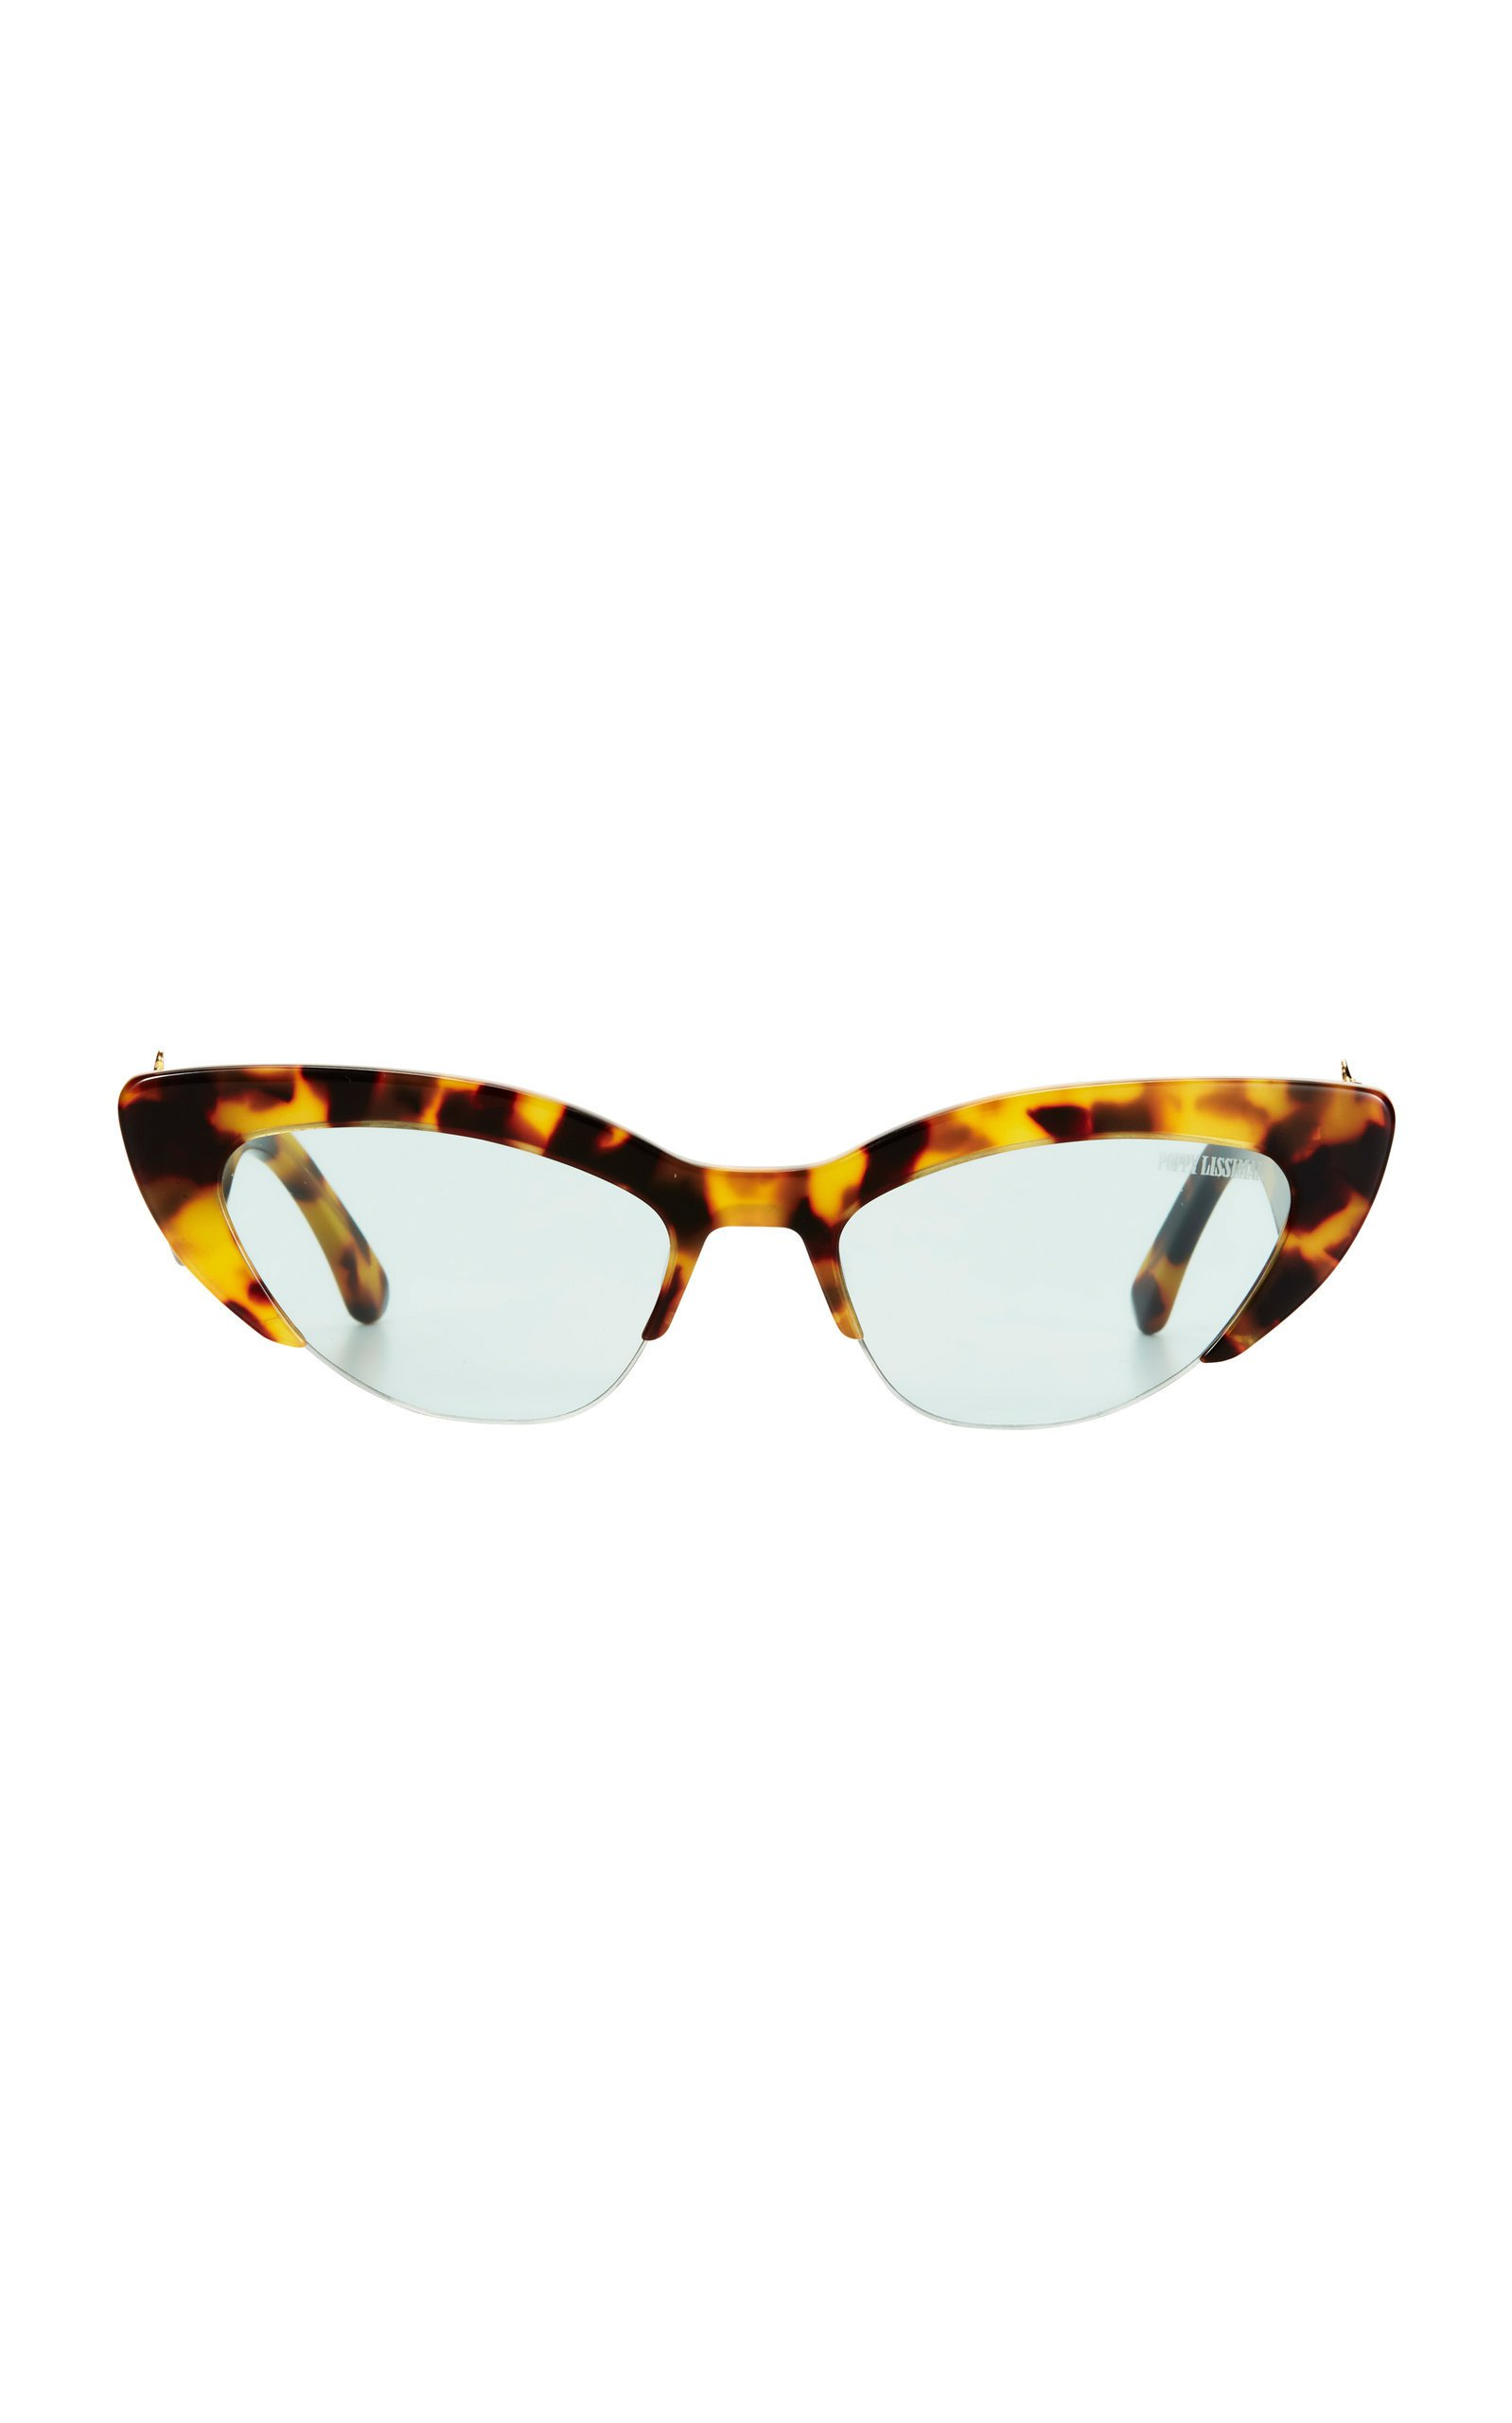 Poppy Lissiman Solstice Cat-Eye Sunglasses